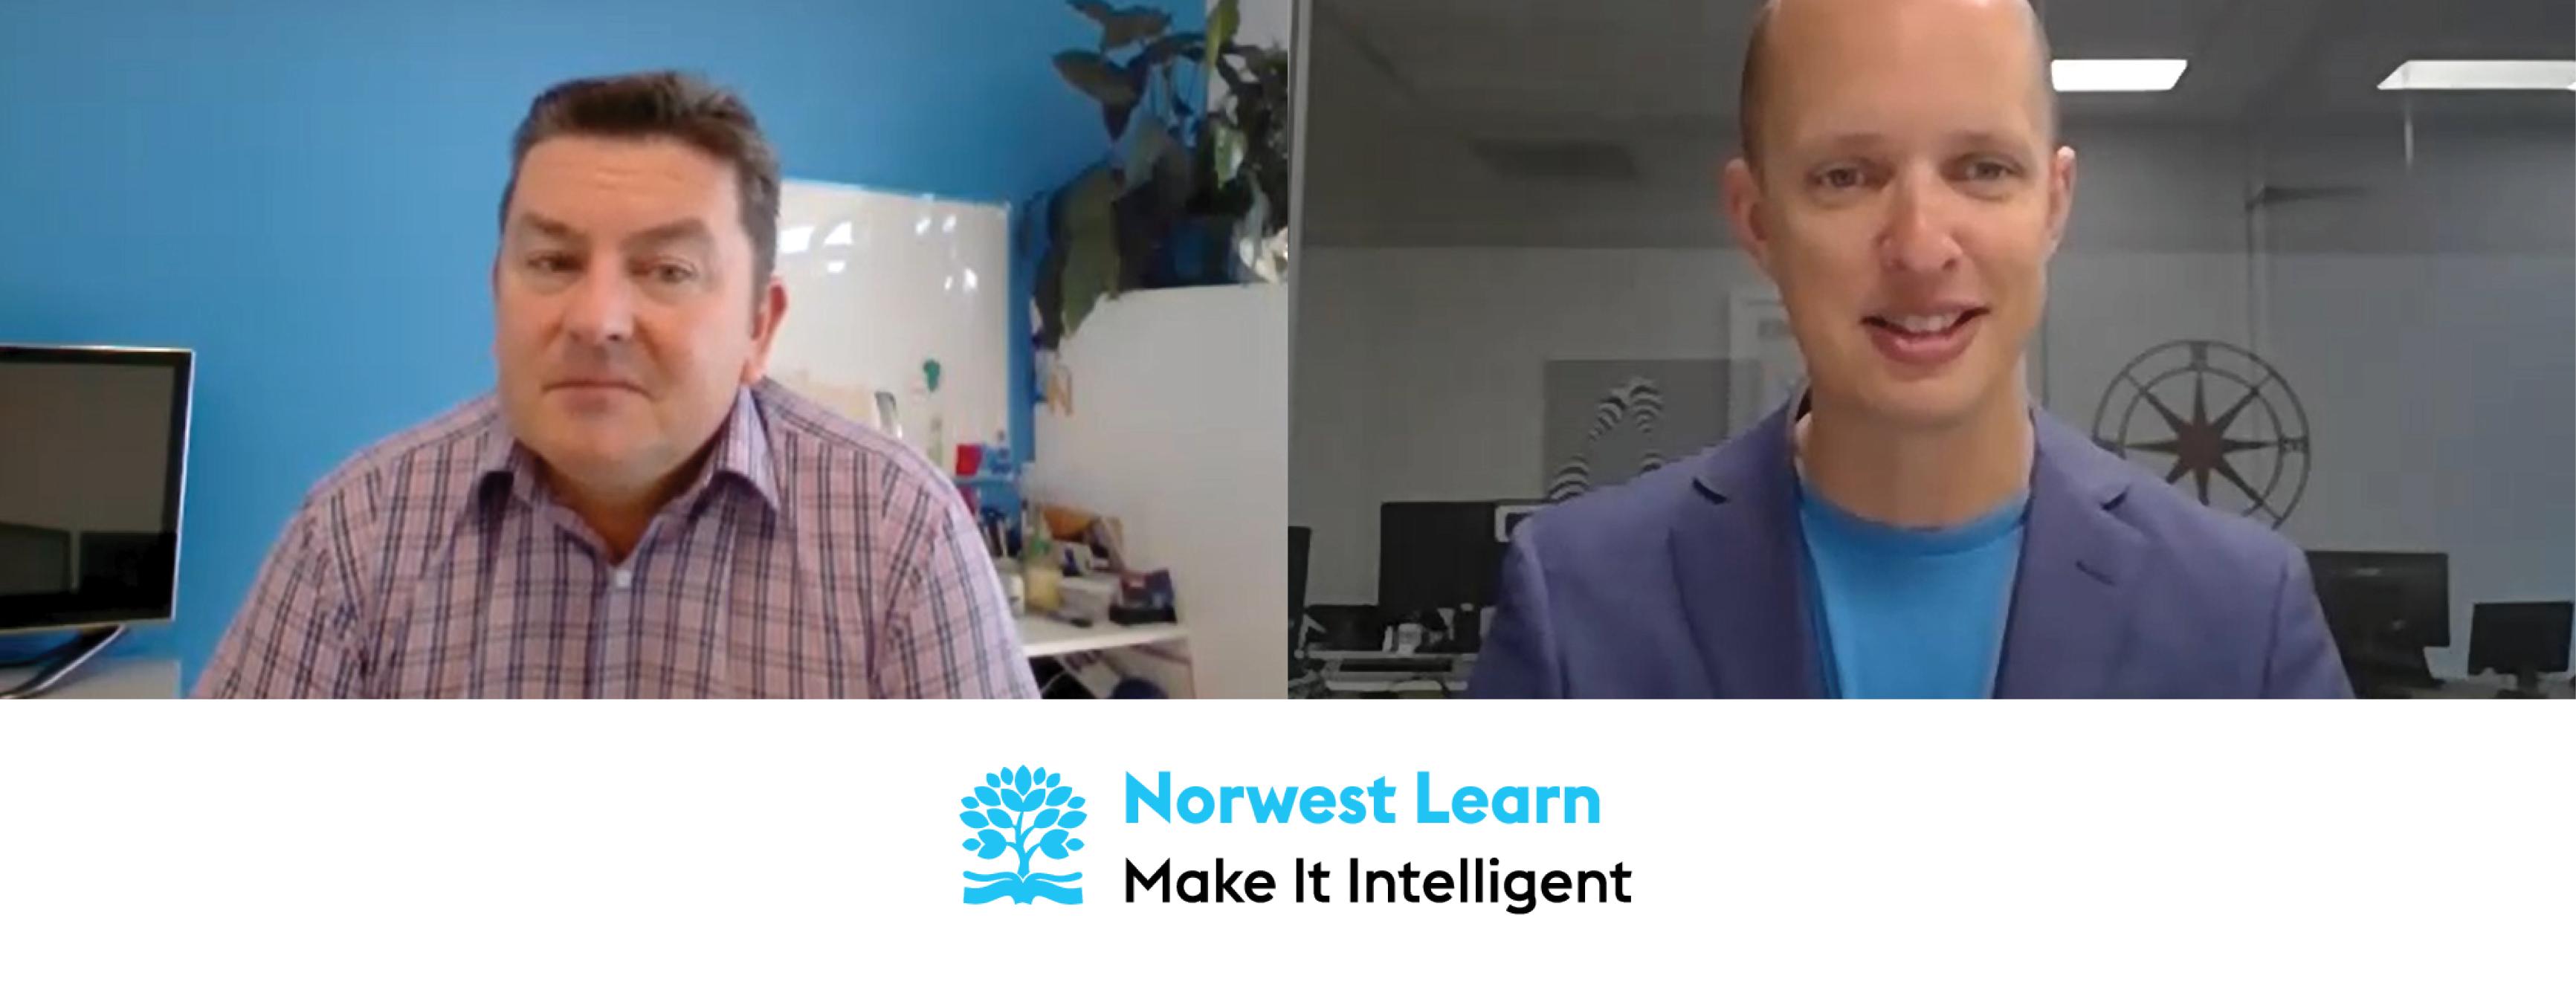 Mulpha Norwest Lifelong Learning